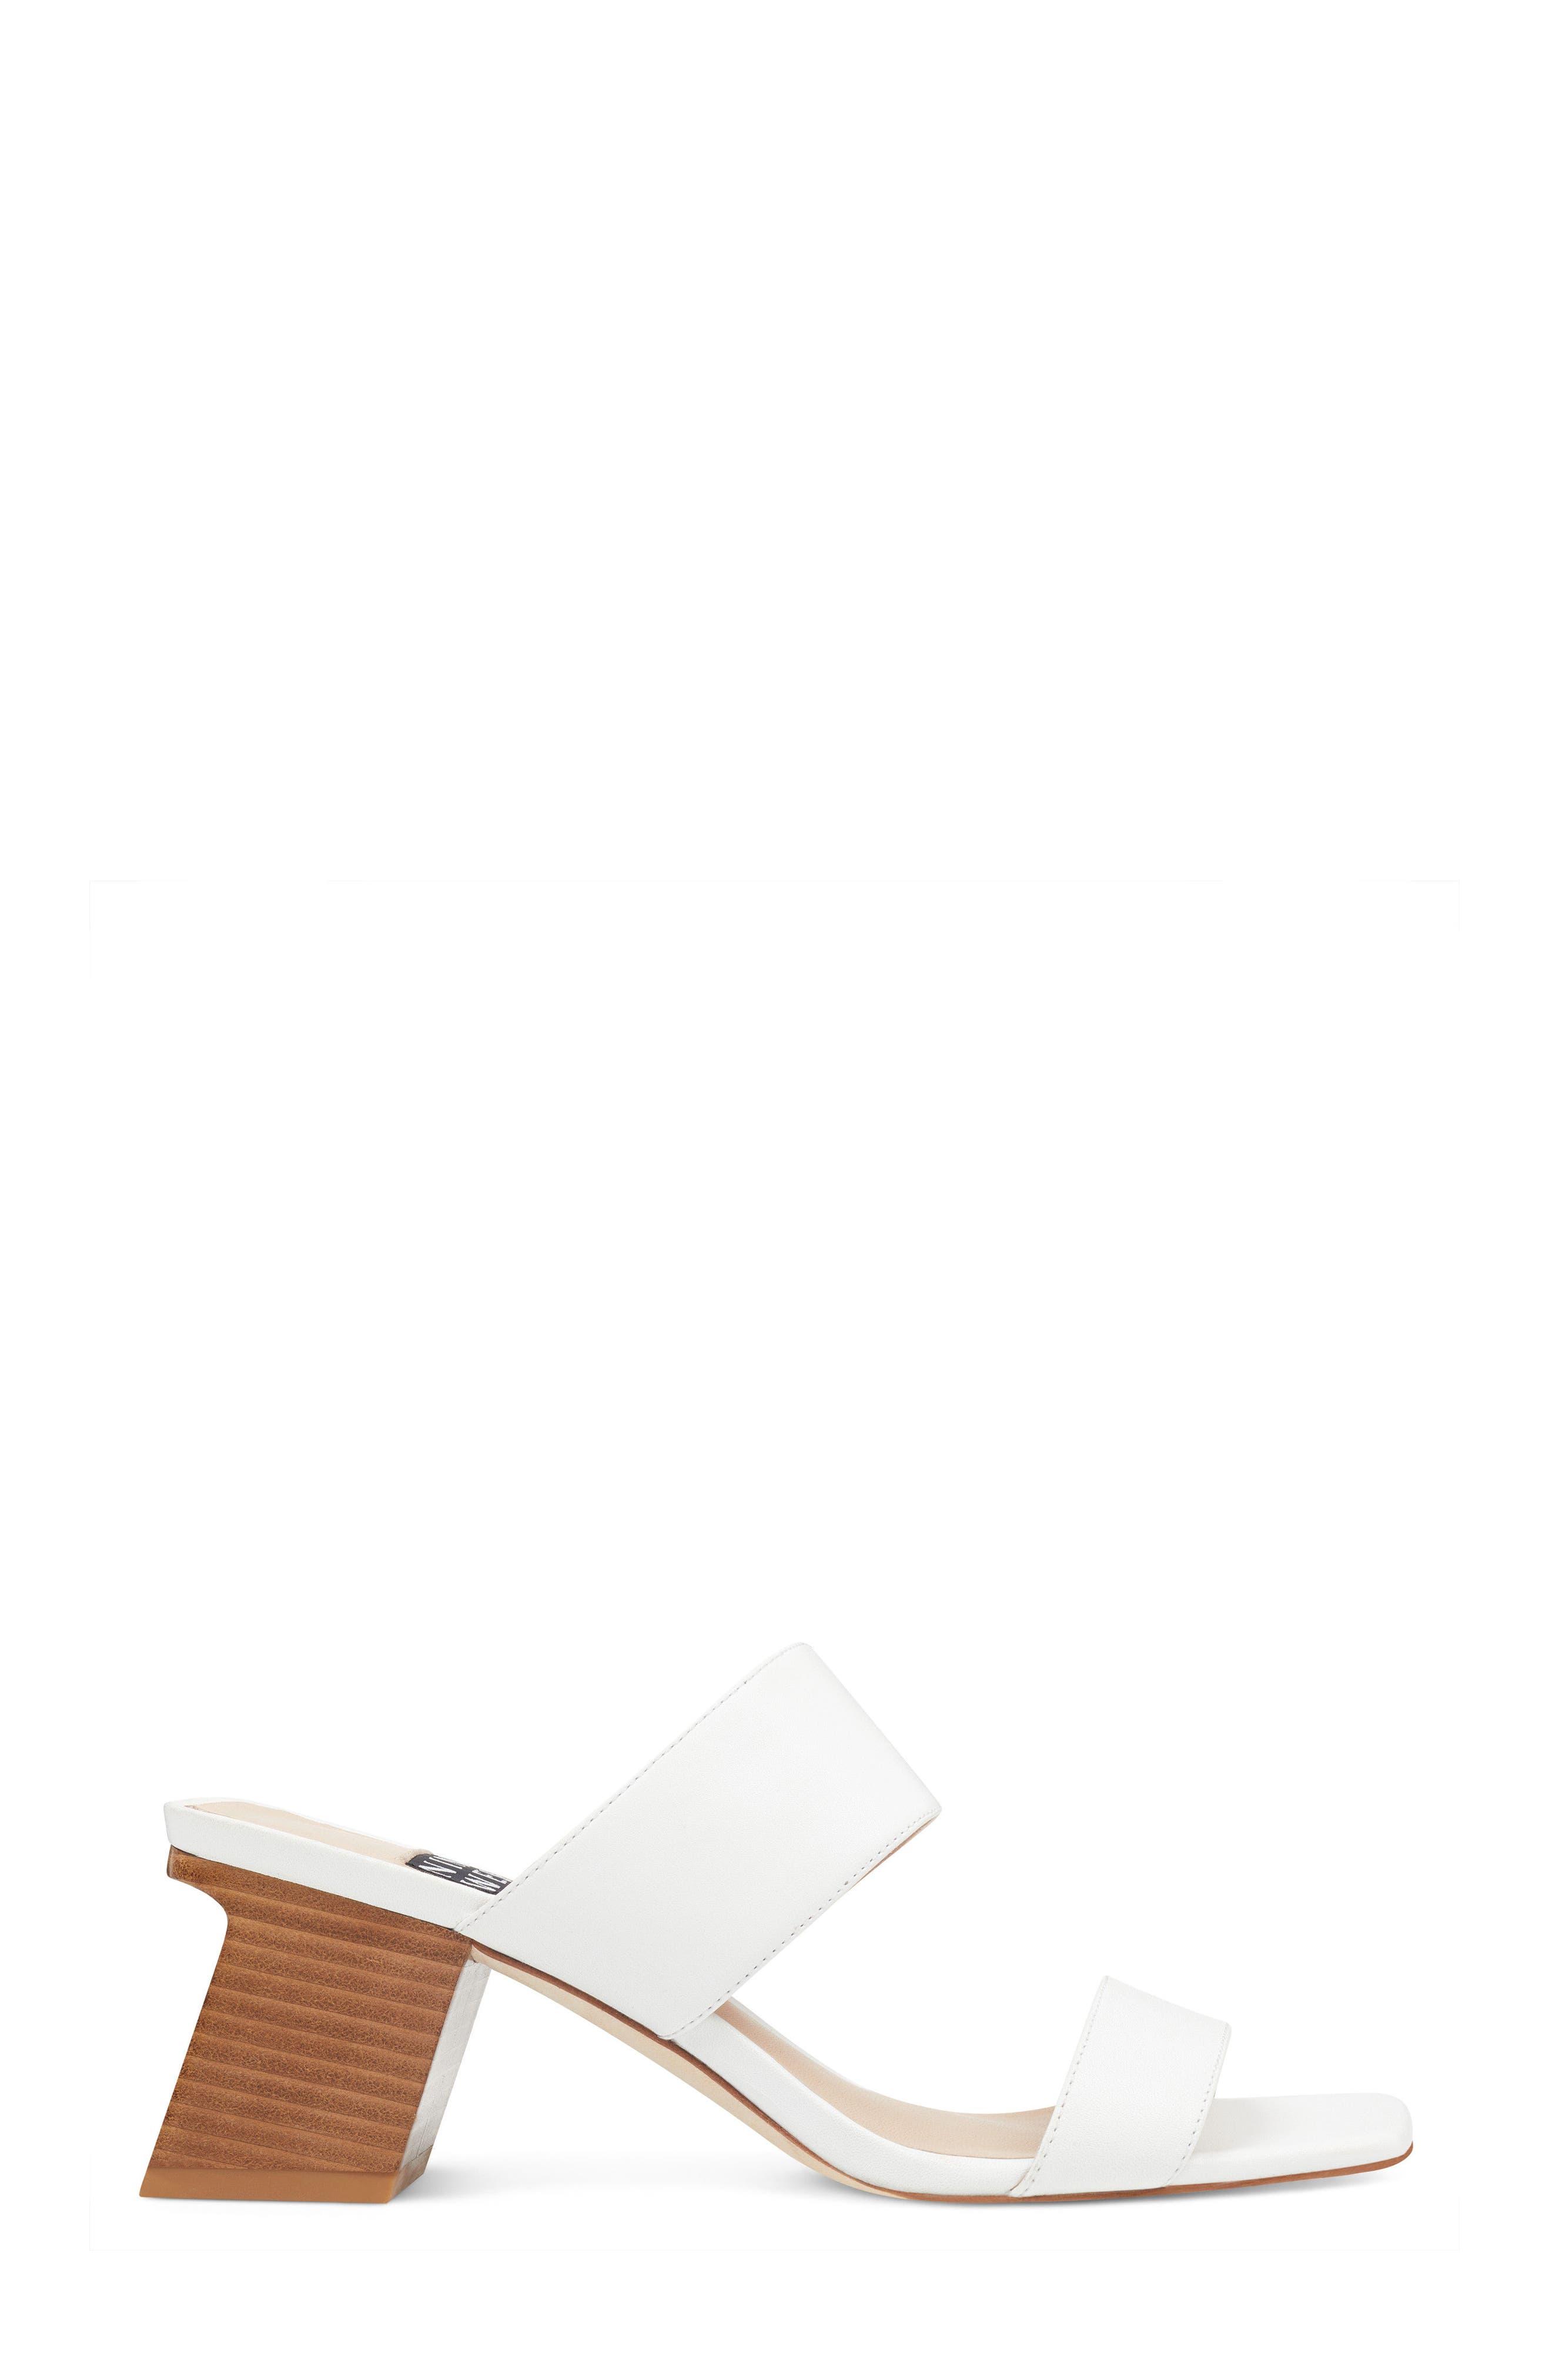 Churen - 40th Anniversary Capsule Collection Sandal,                             Alternate thumbnail 3, color,                             White Leather